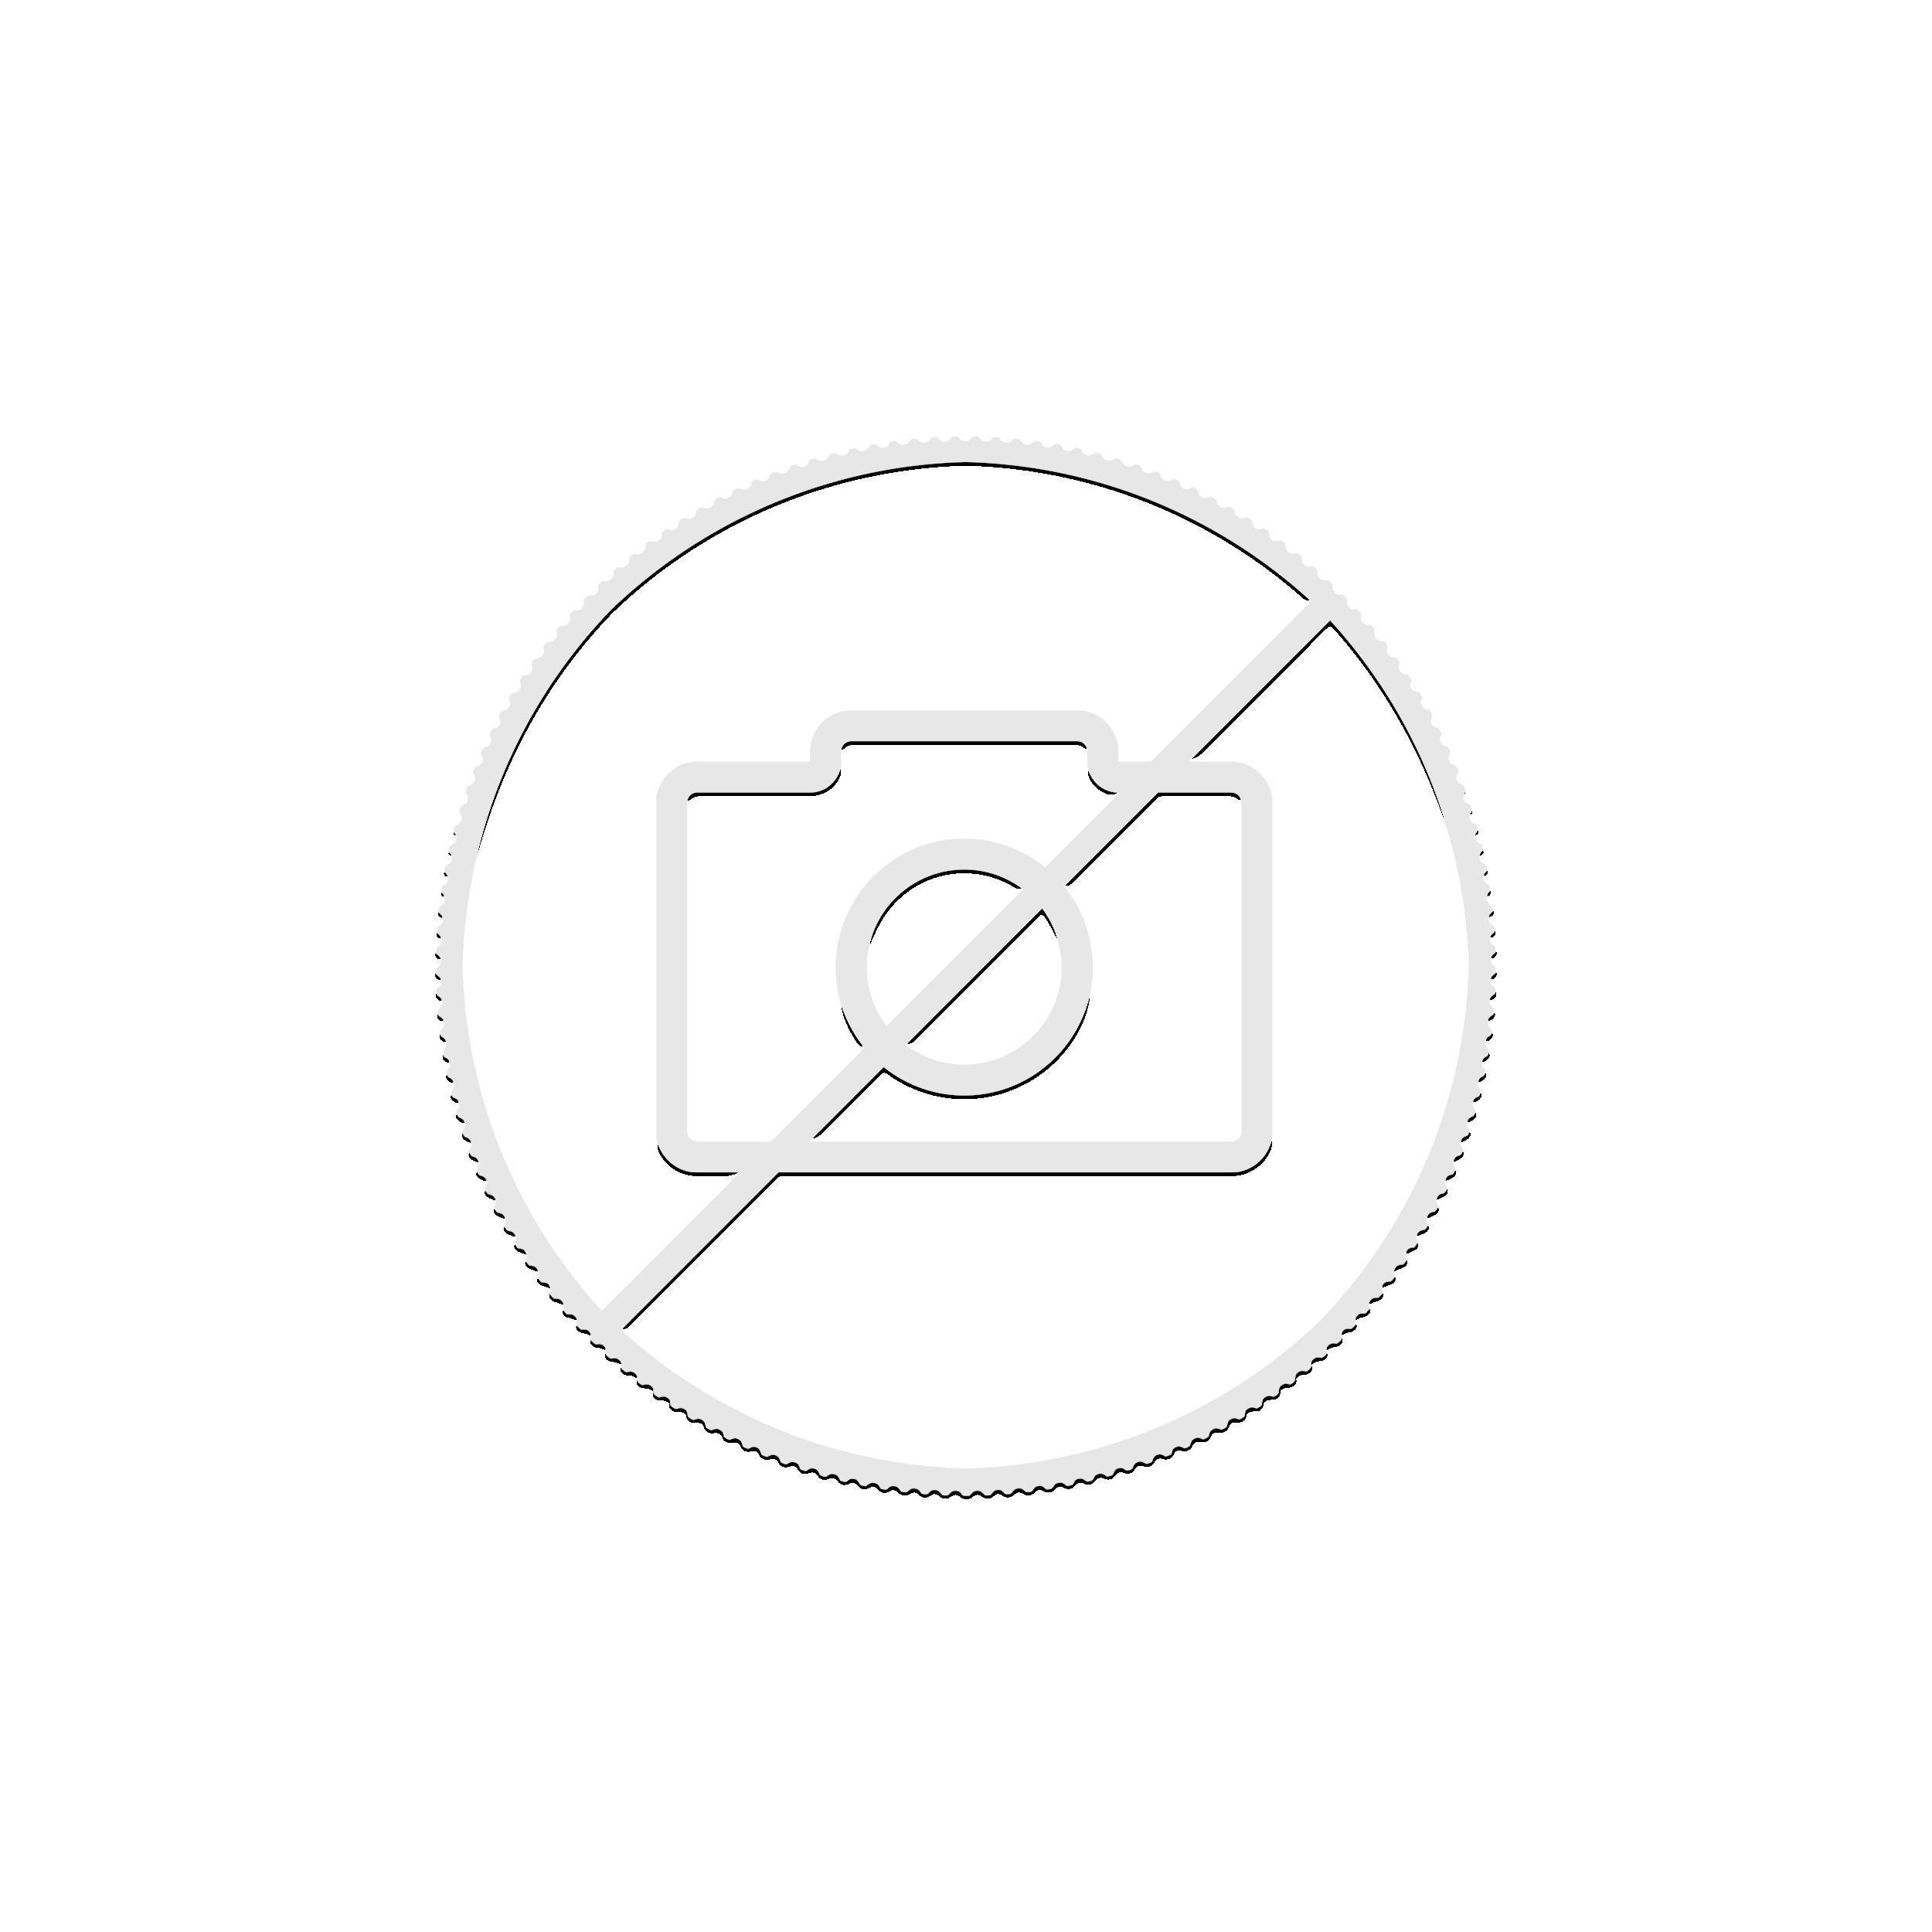 Zilveren munt lunar 2021 os